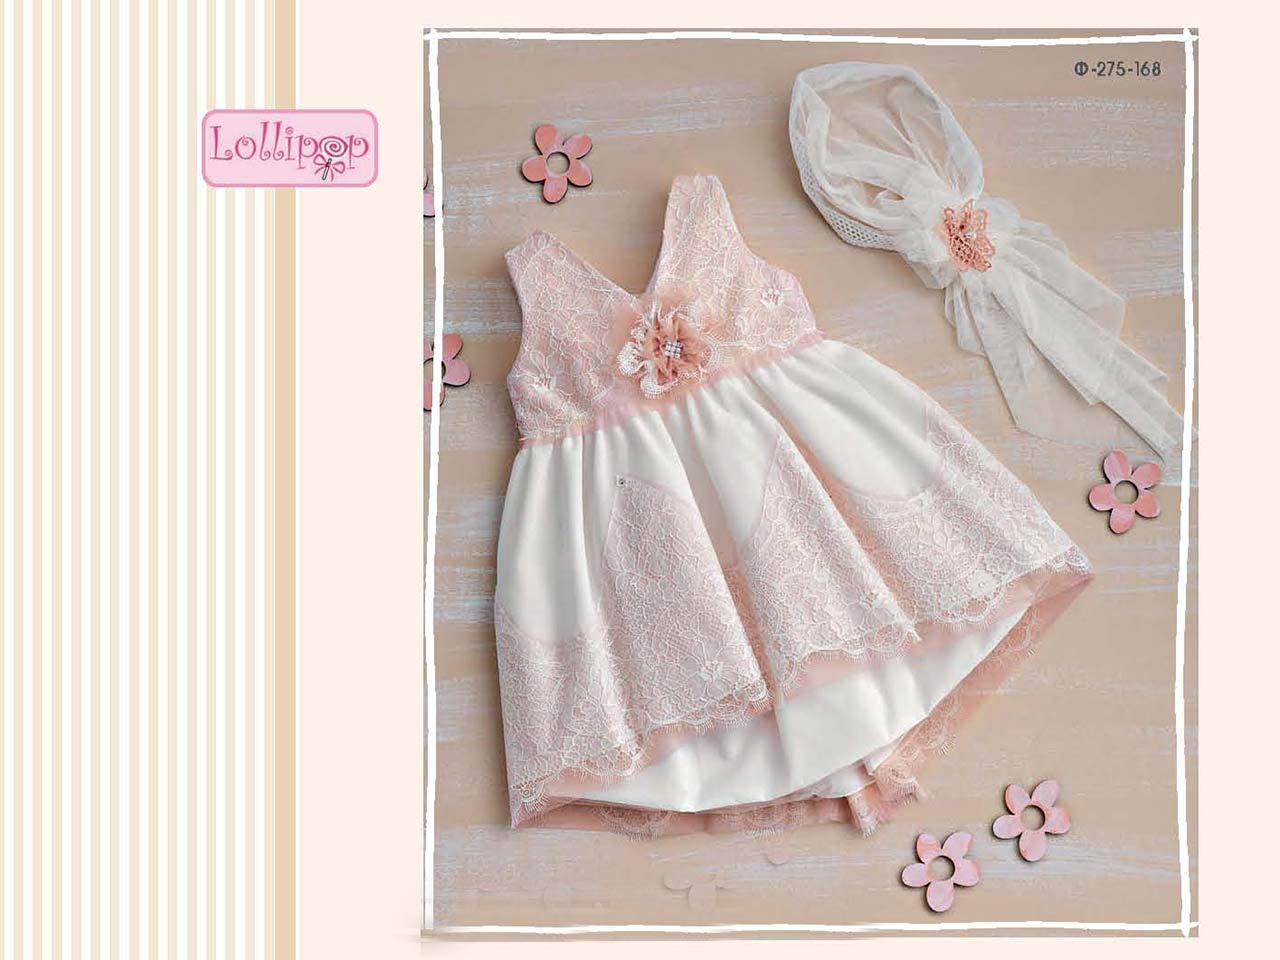 88567bcafe4 ... Ρούχα / Βαπτιστικό Φόρεμα Δαντέλα Σομόν και Λευκό. 🔍.  vaptistiko-forema-f275-168